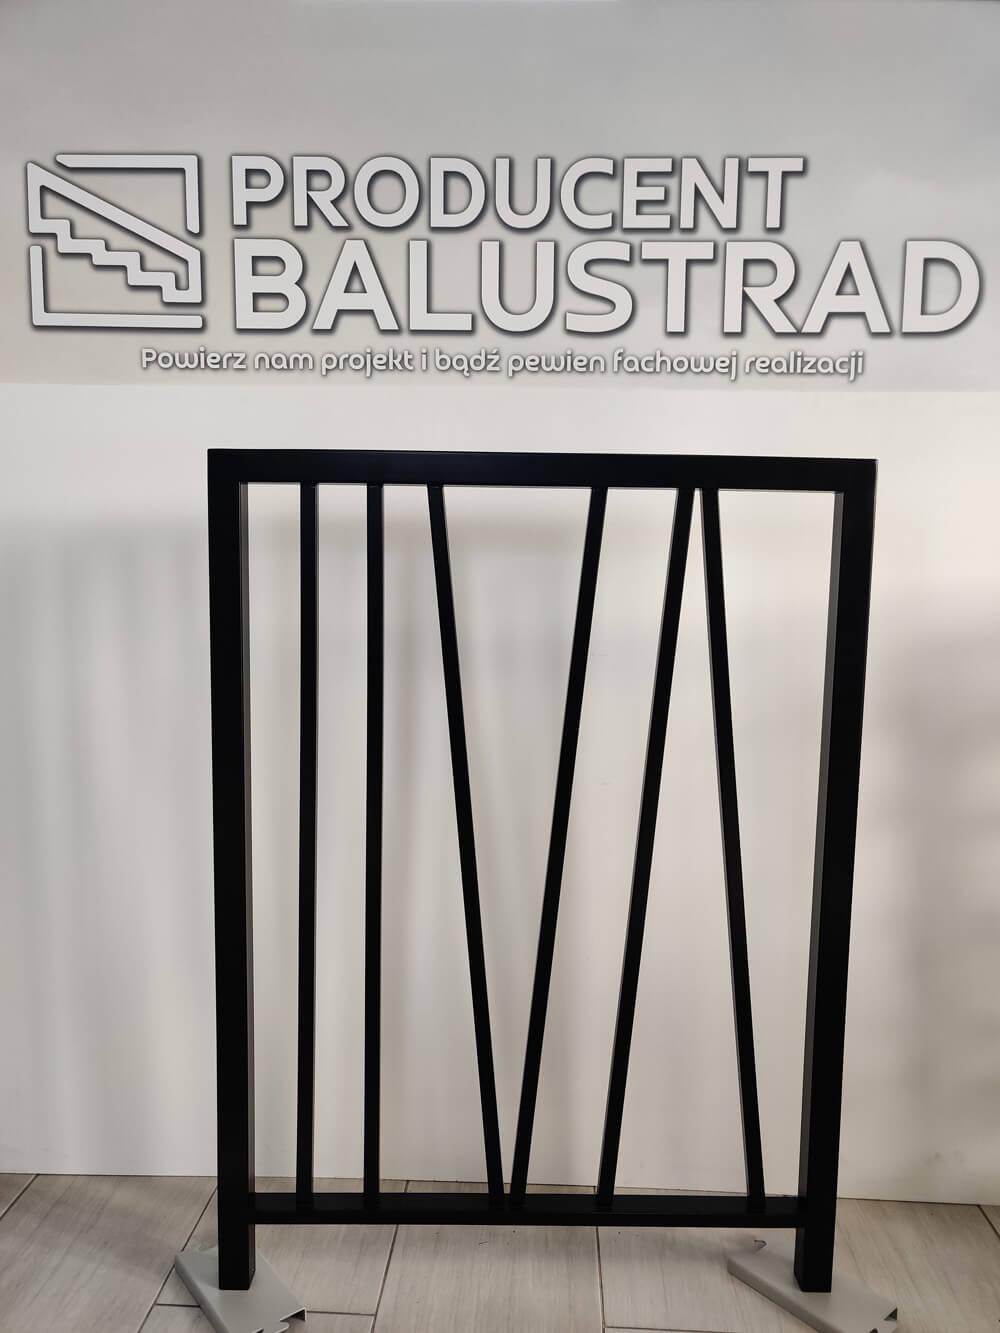 balustrada metalowa